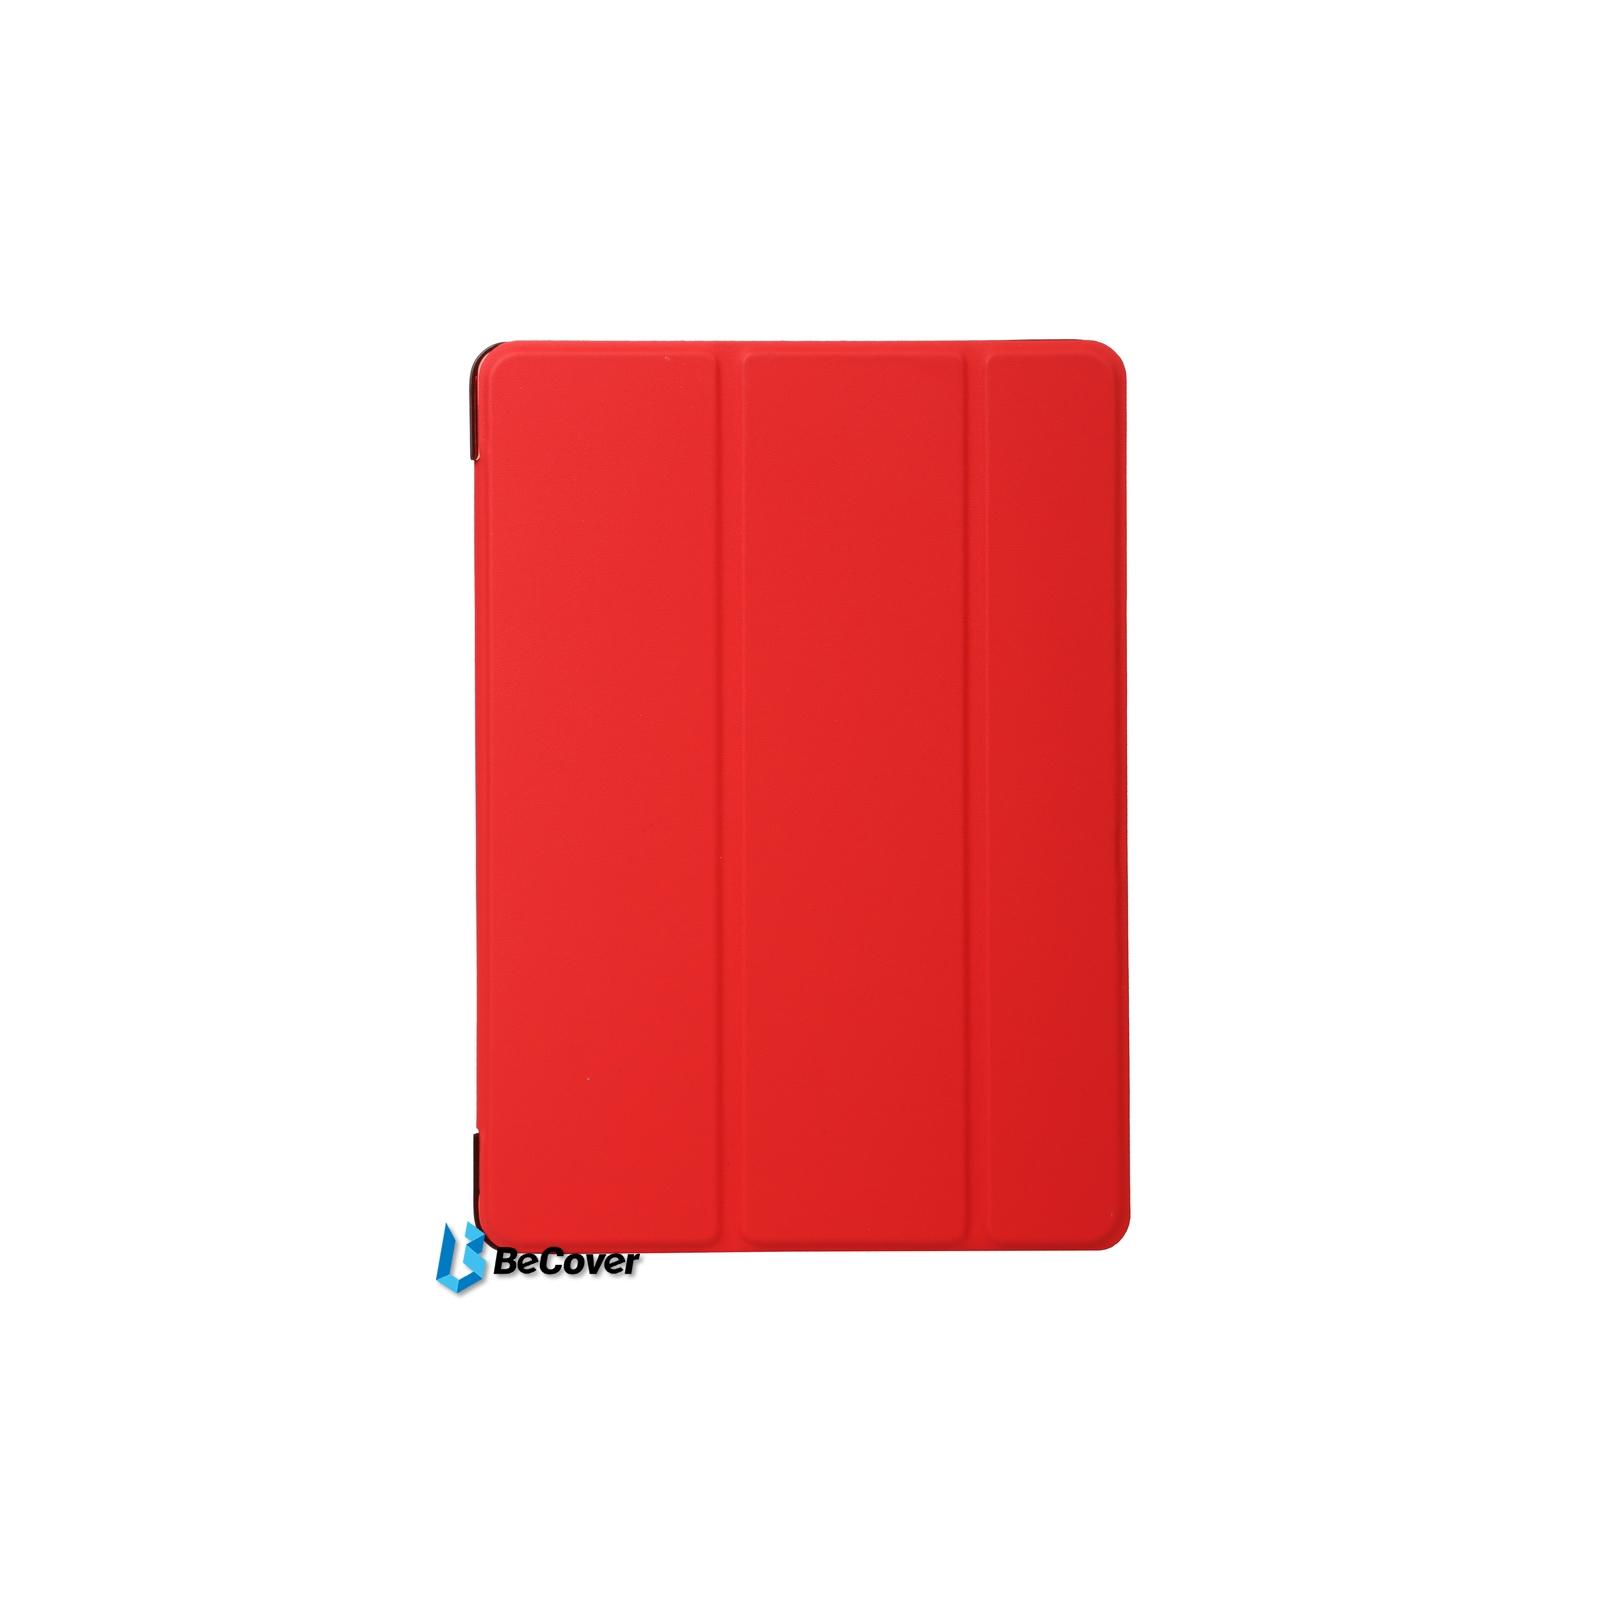 Чехол для планшета BeCover для Apple iPad 10.2 2019/2020 Red (704141)